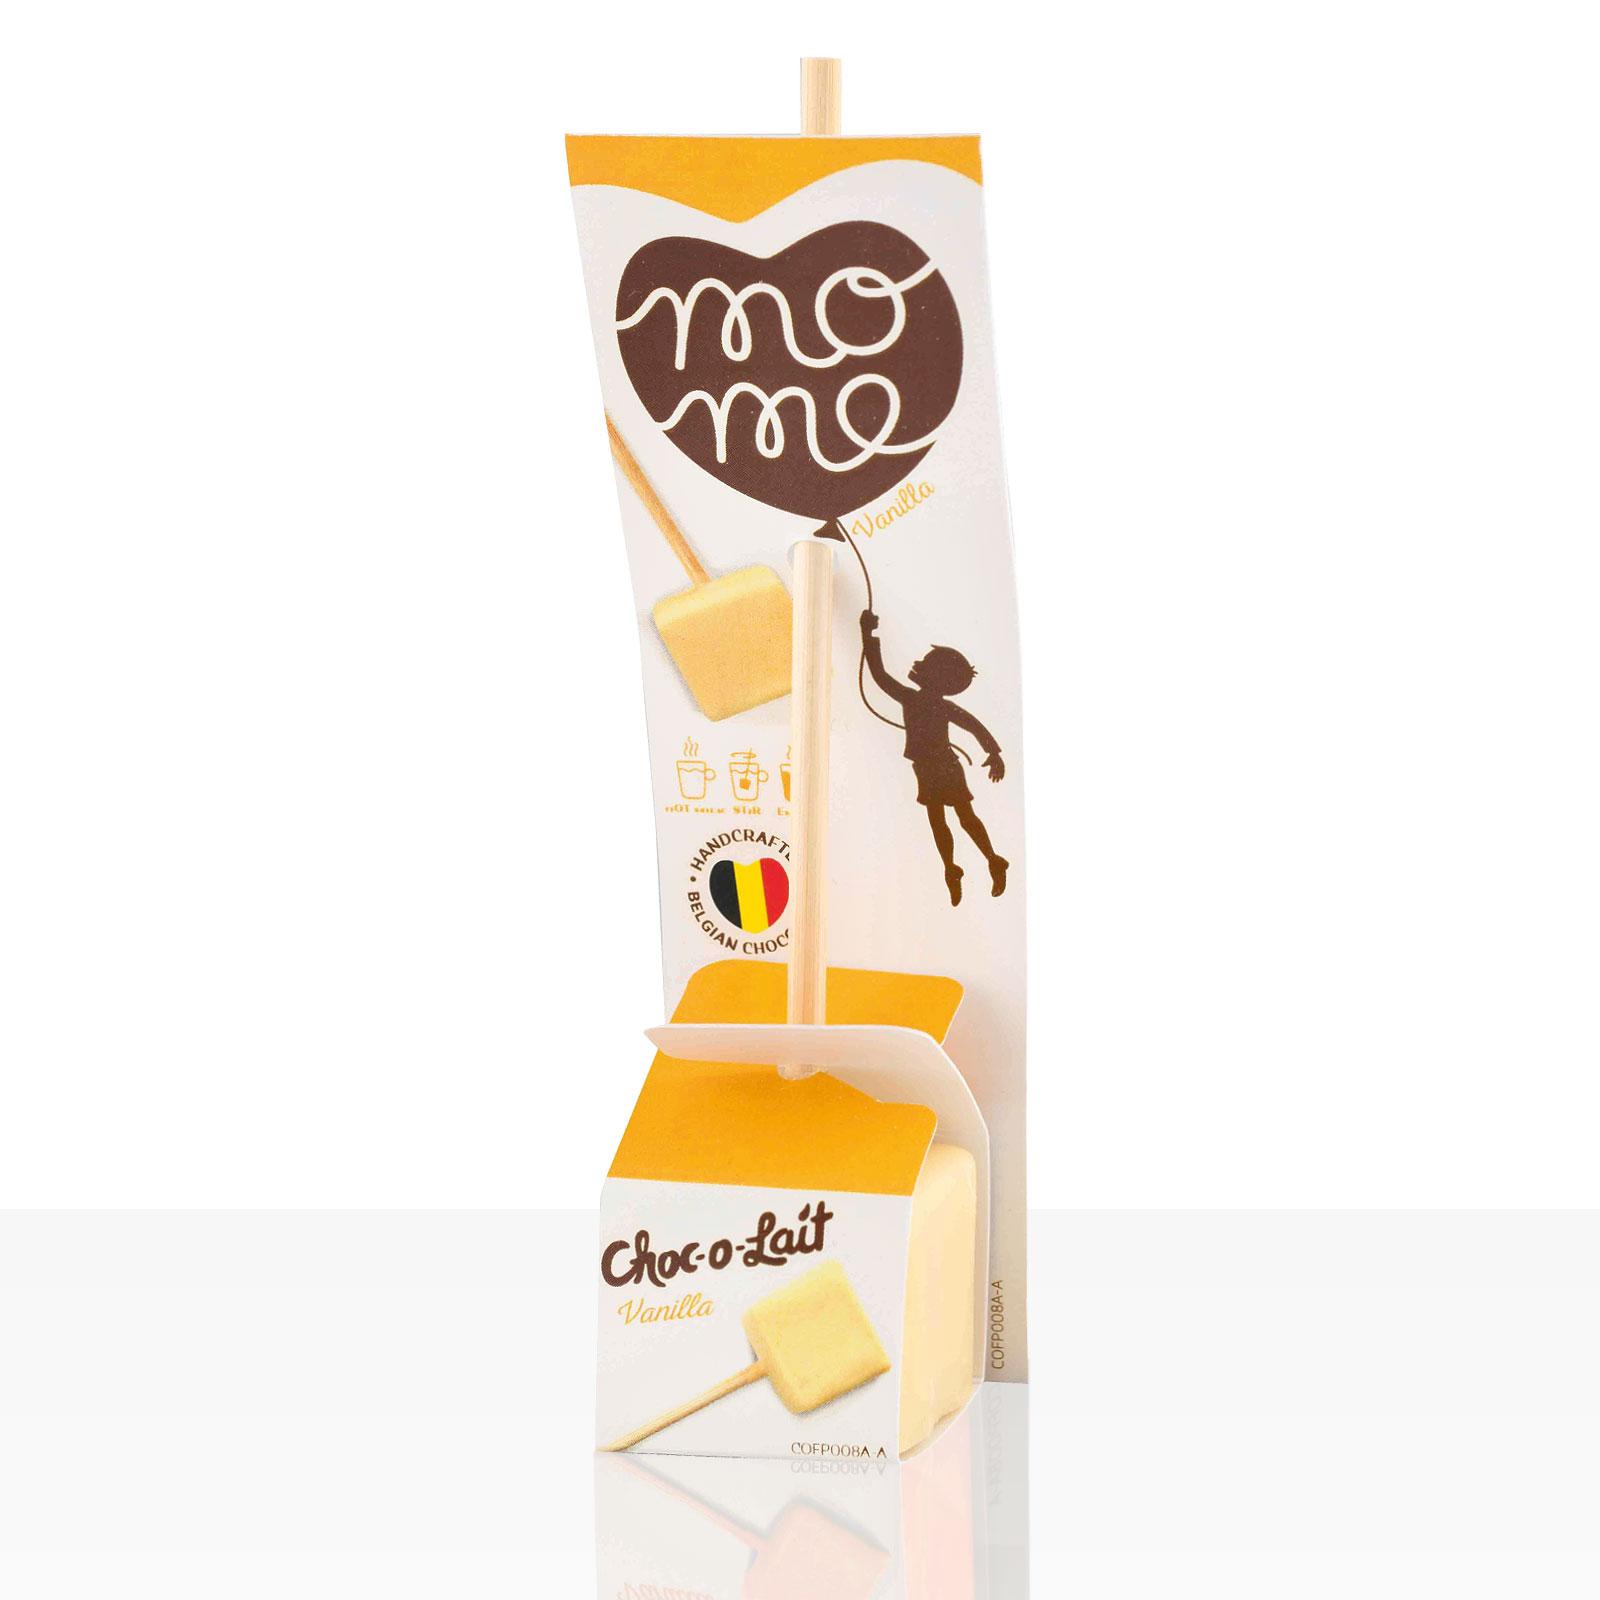 Choc-o-lait Trinkschokolade am Stiel Vanilla 1Stk